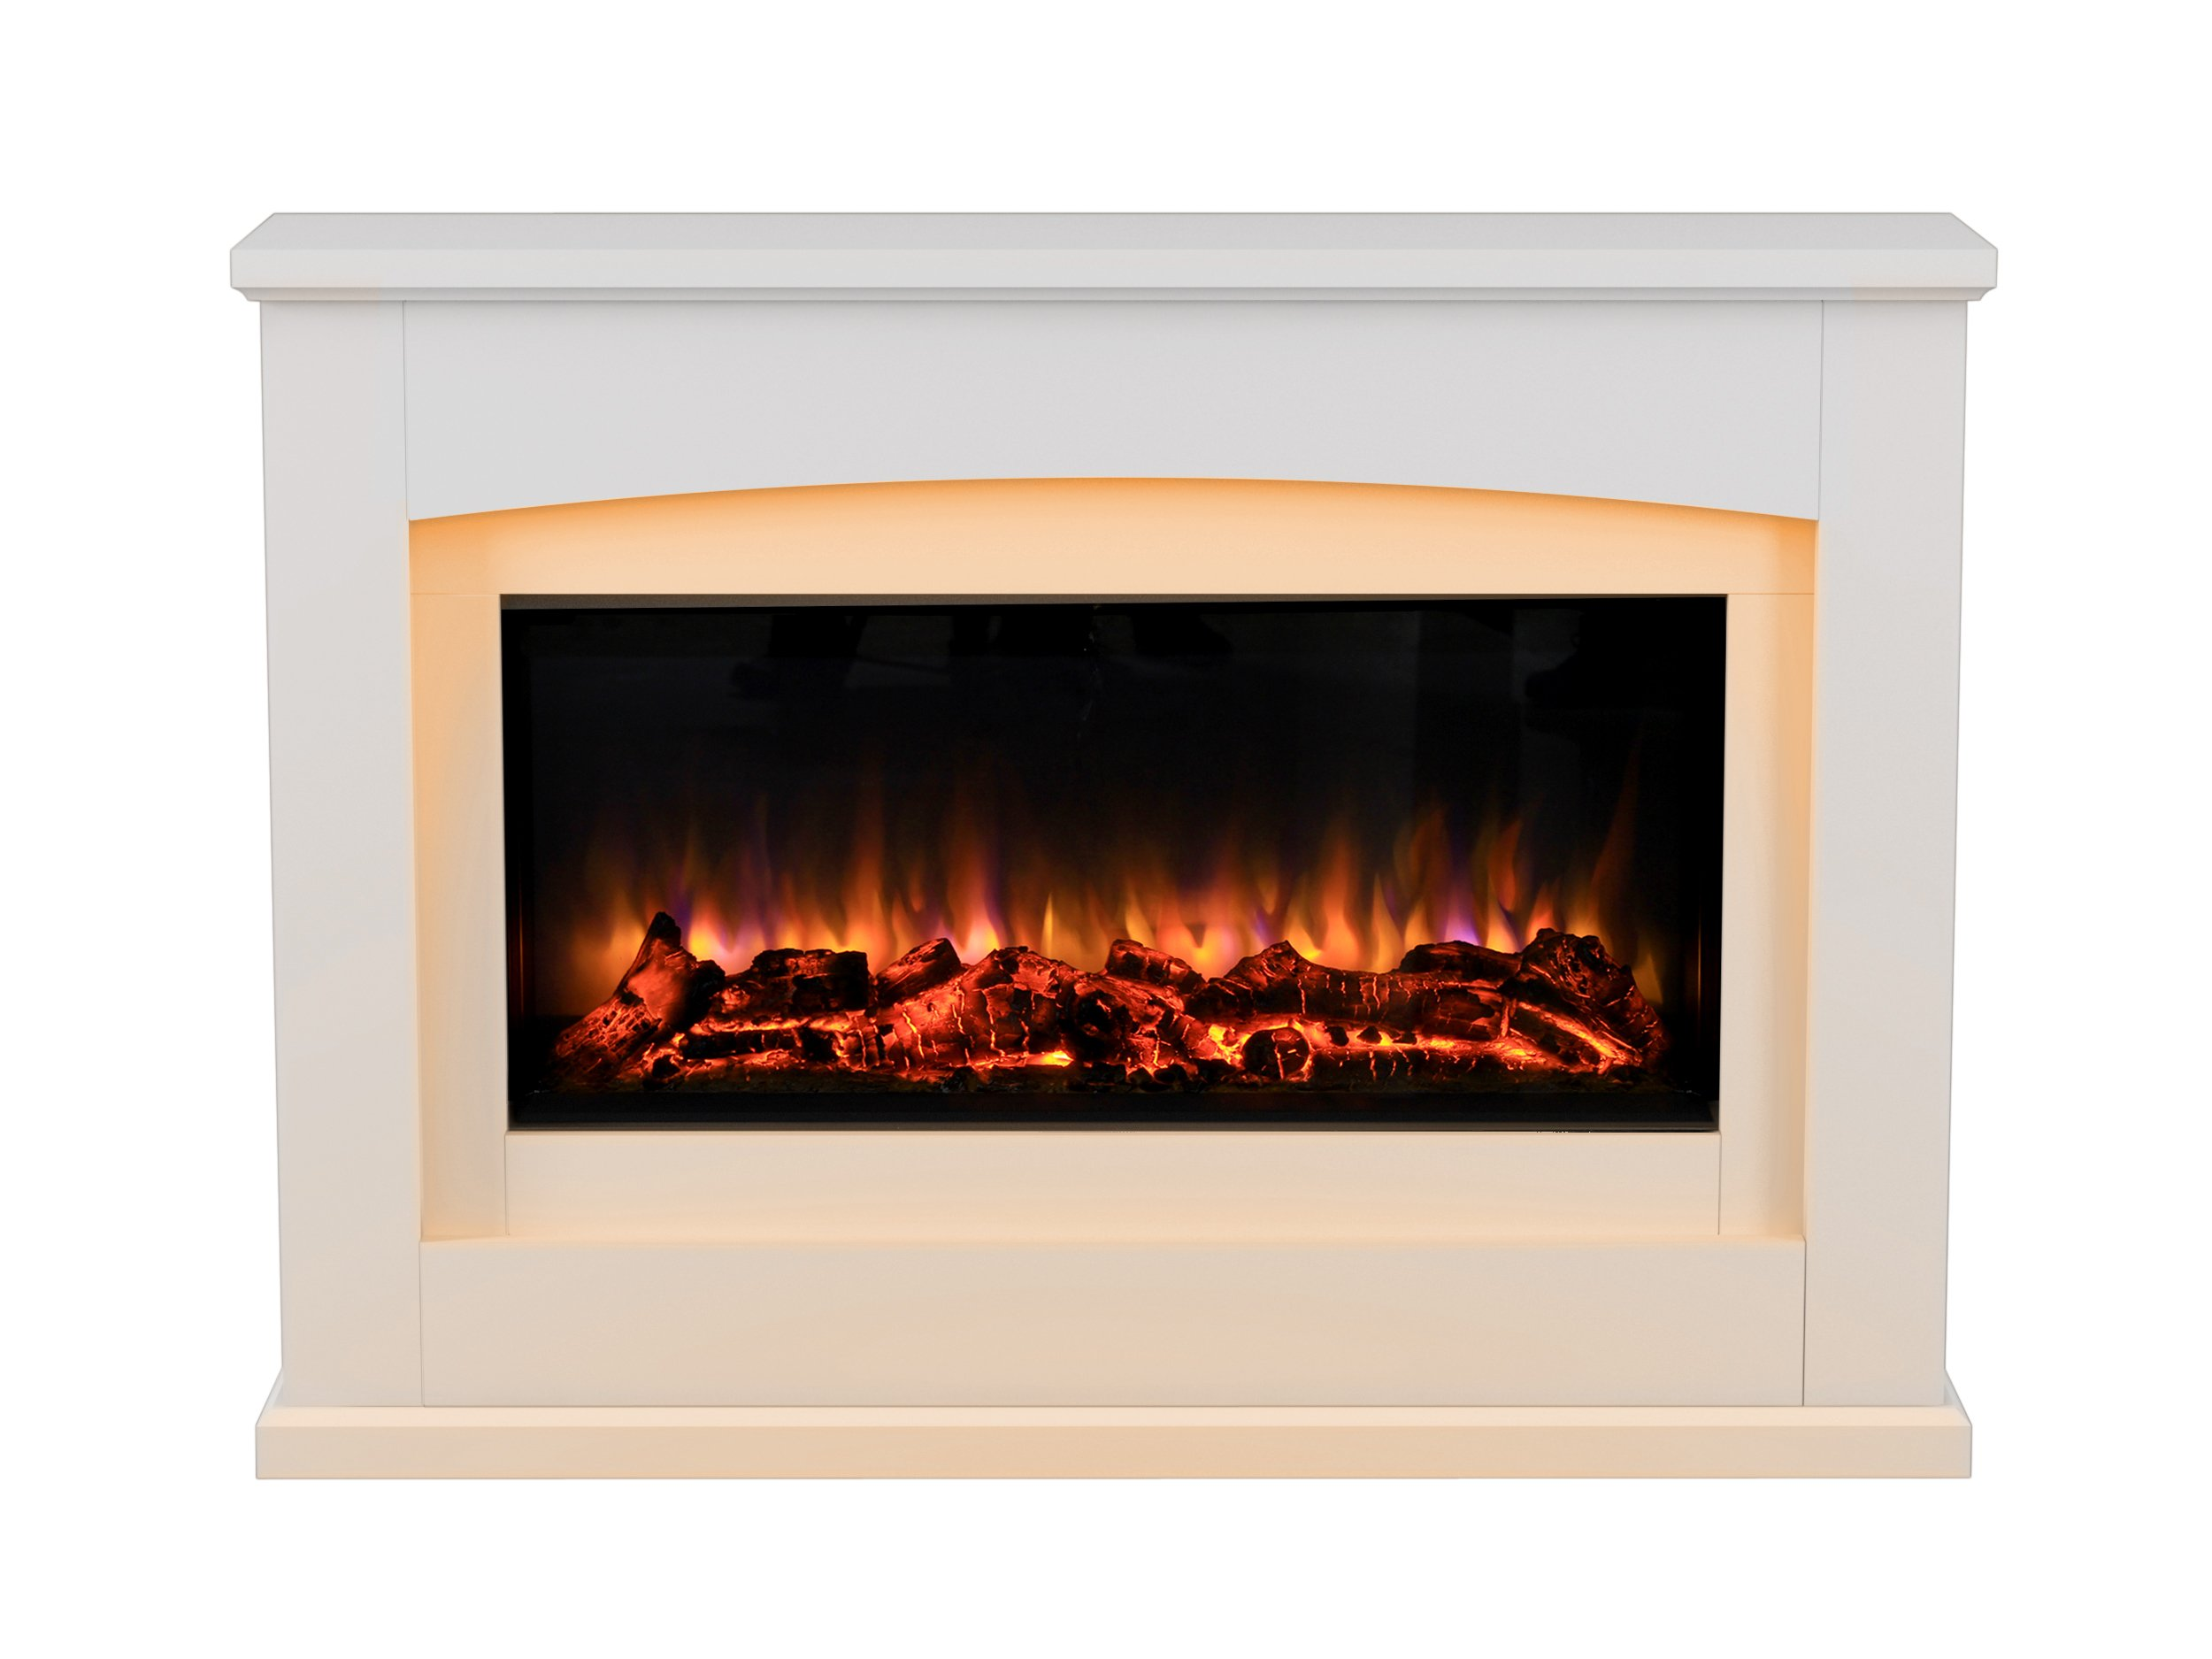 Chimenea eléctrica Danby Suite de vidrio frente a fuego eléctrico 220/240 VCA, 7